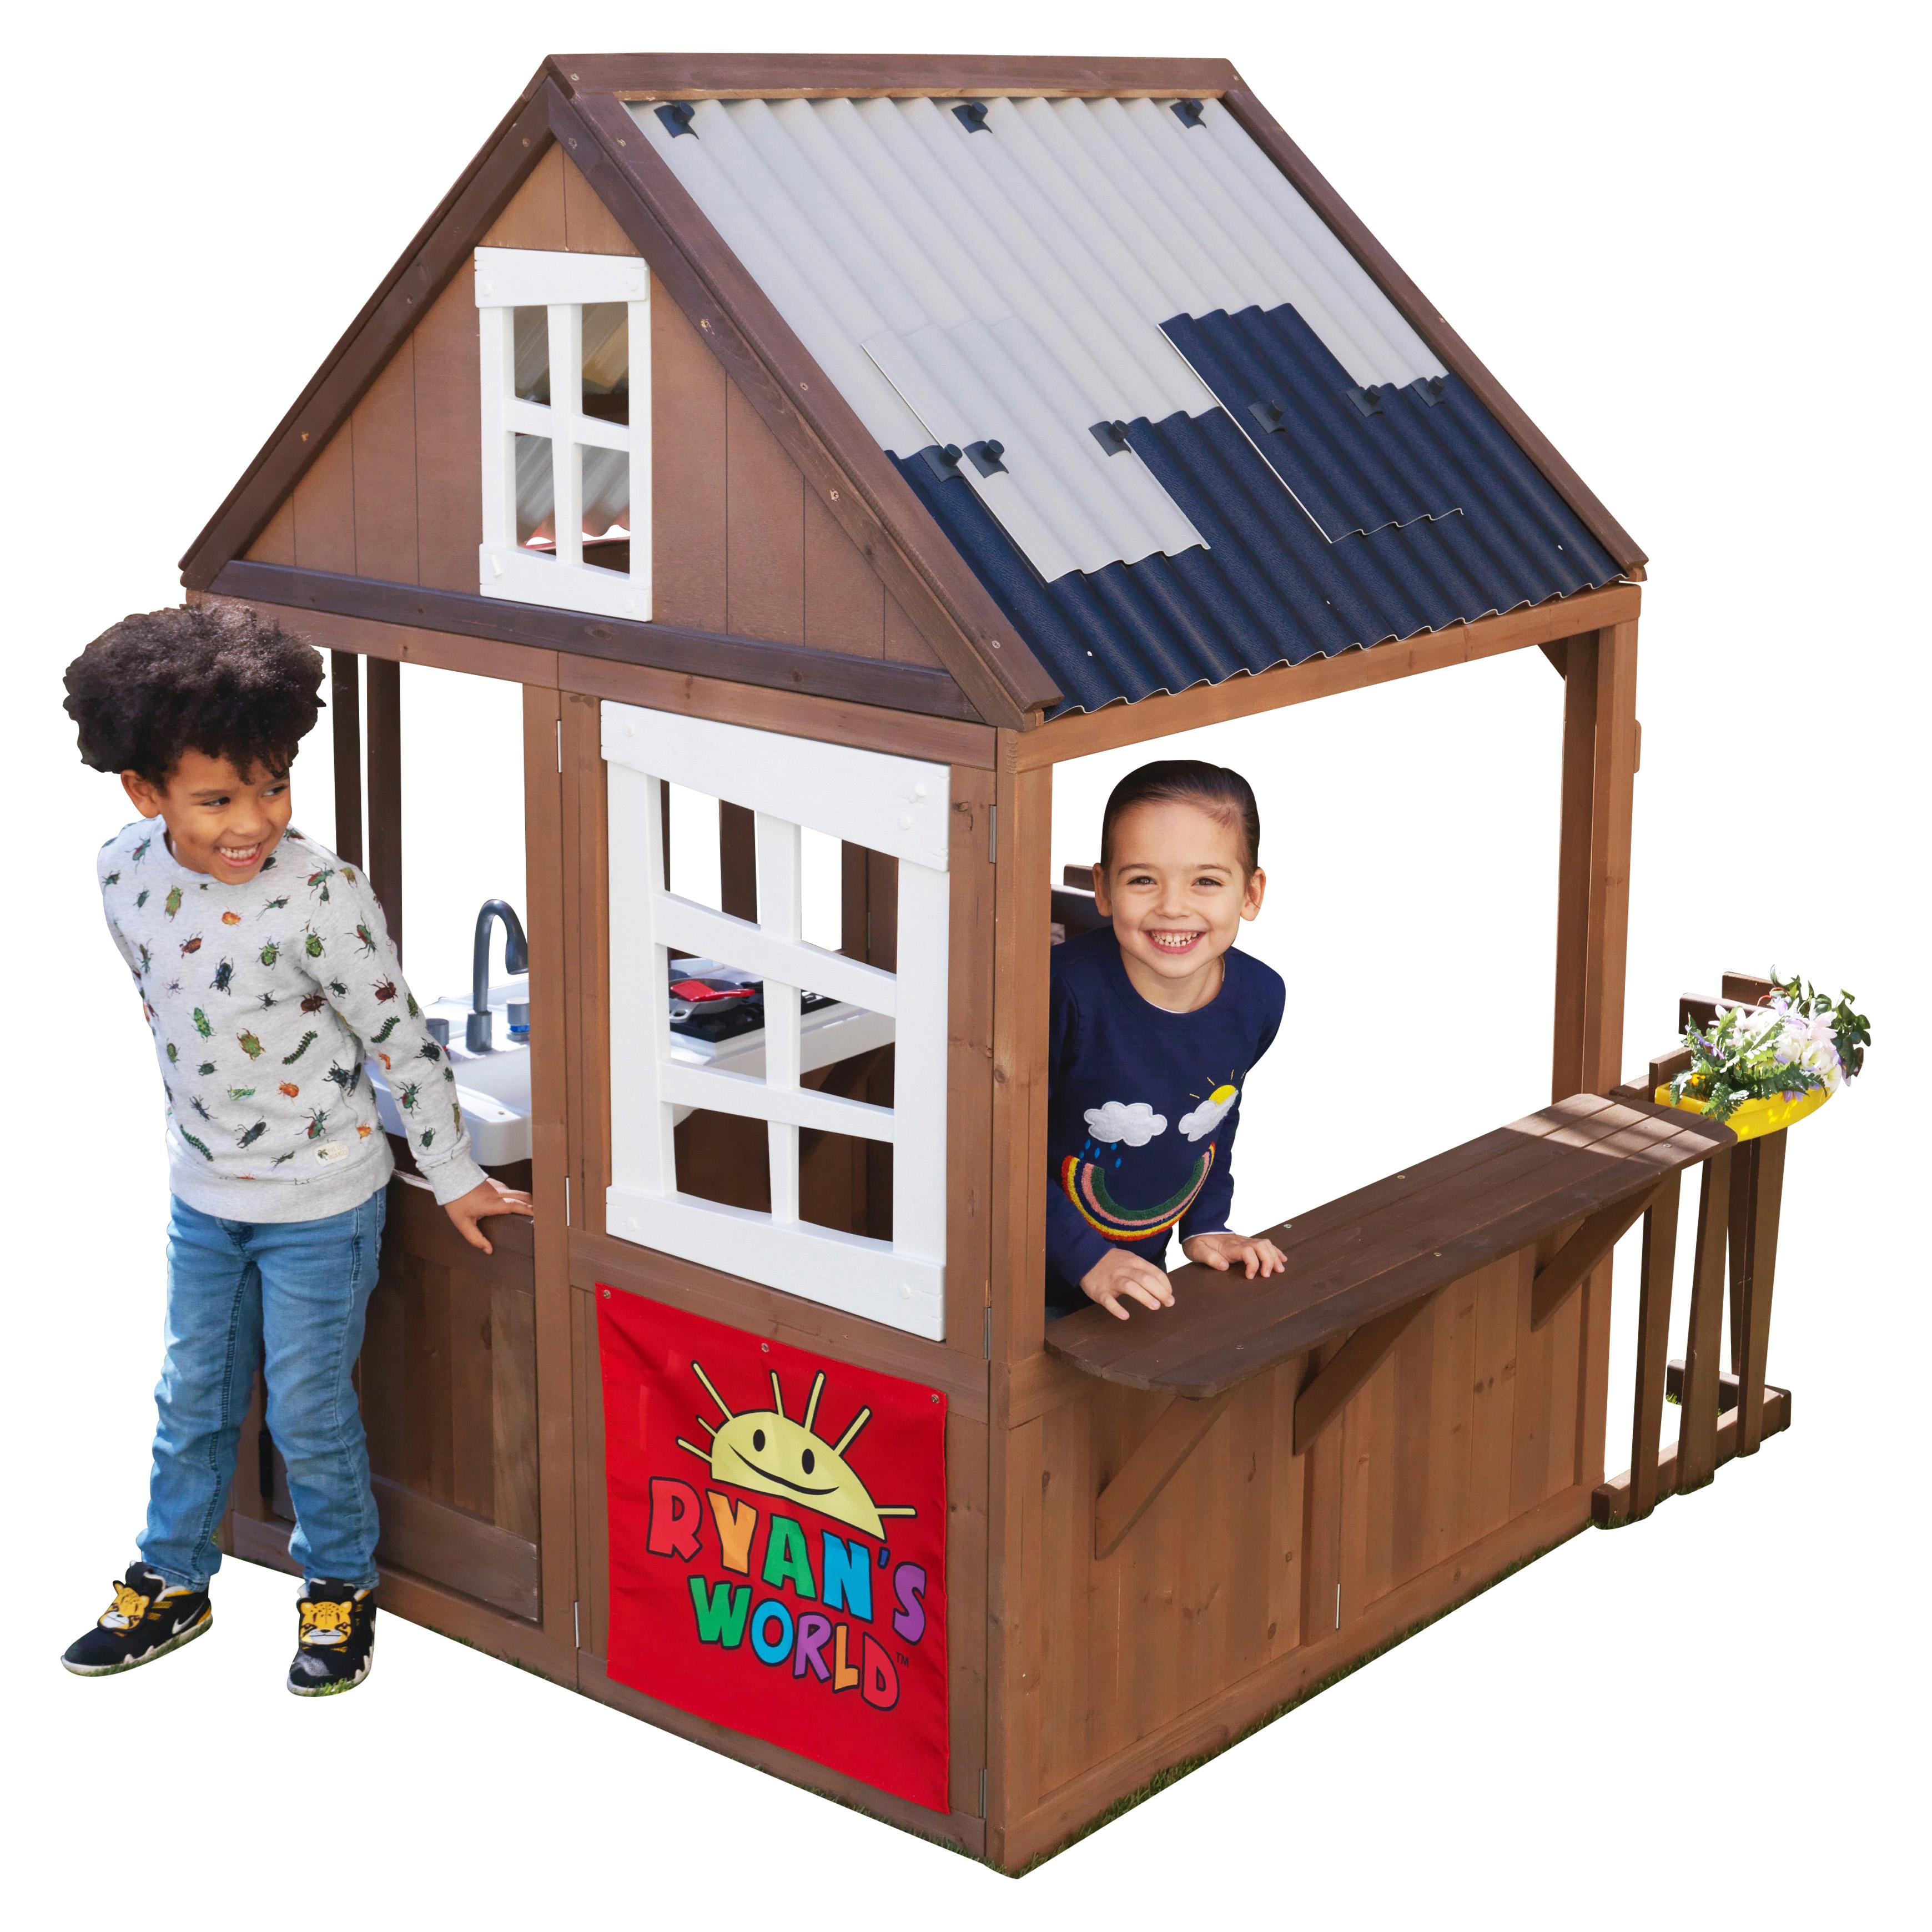 KidKraft Ryan's World Outdoor Playhouse $250 + Free Shipping